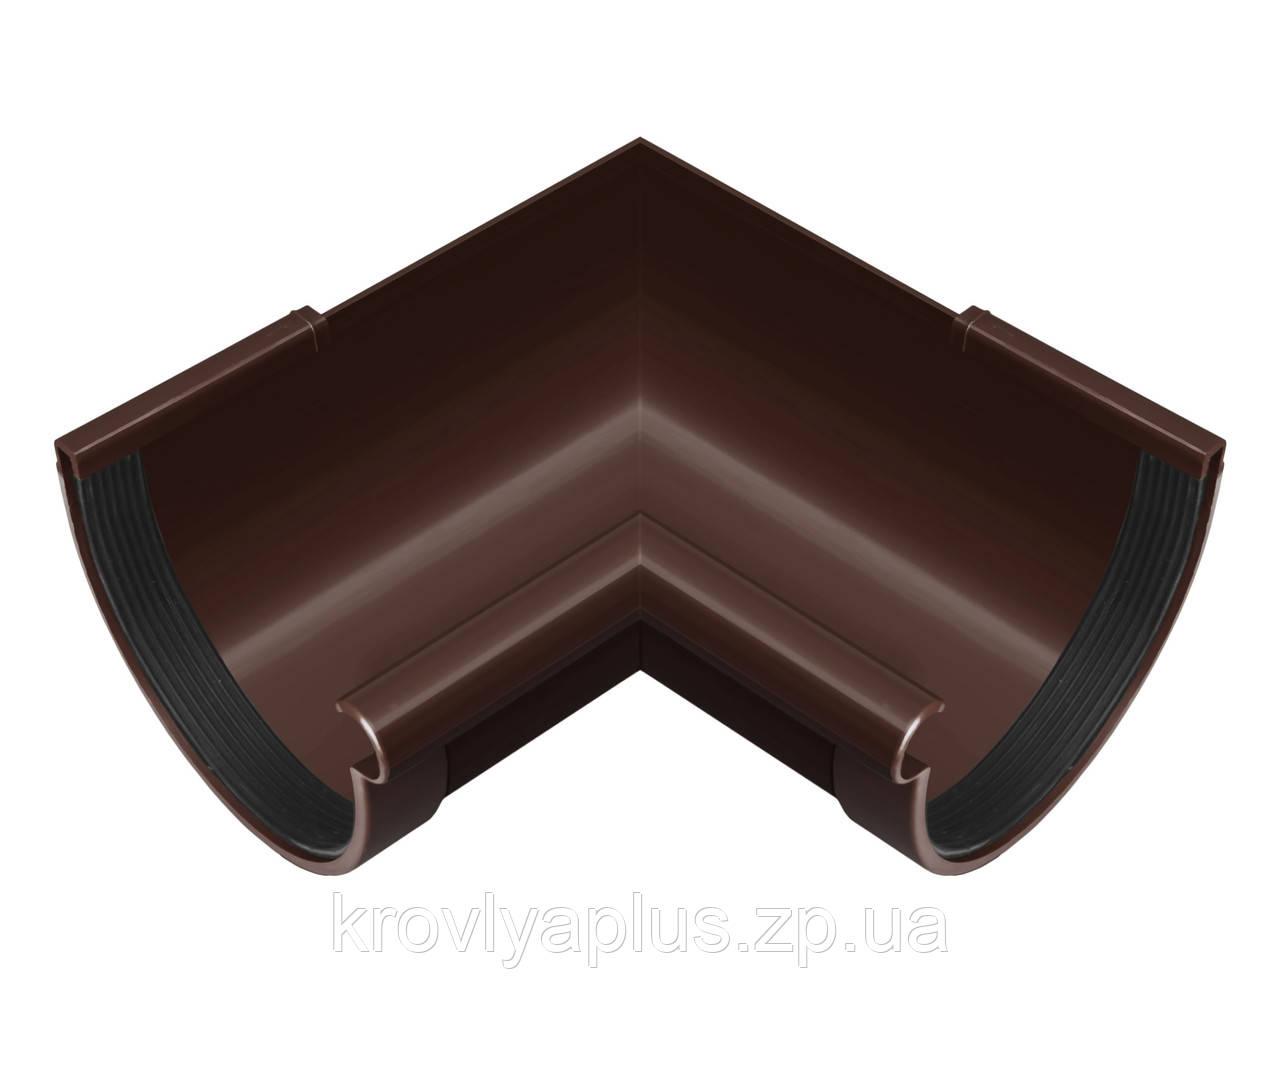 Угол (поворот) желоба внутренний 90° Ø130 (Rainway, Украина), коричневая.